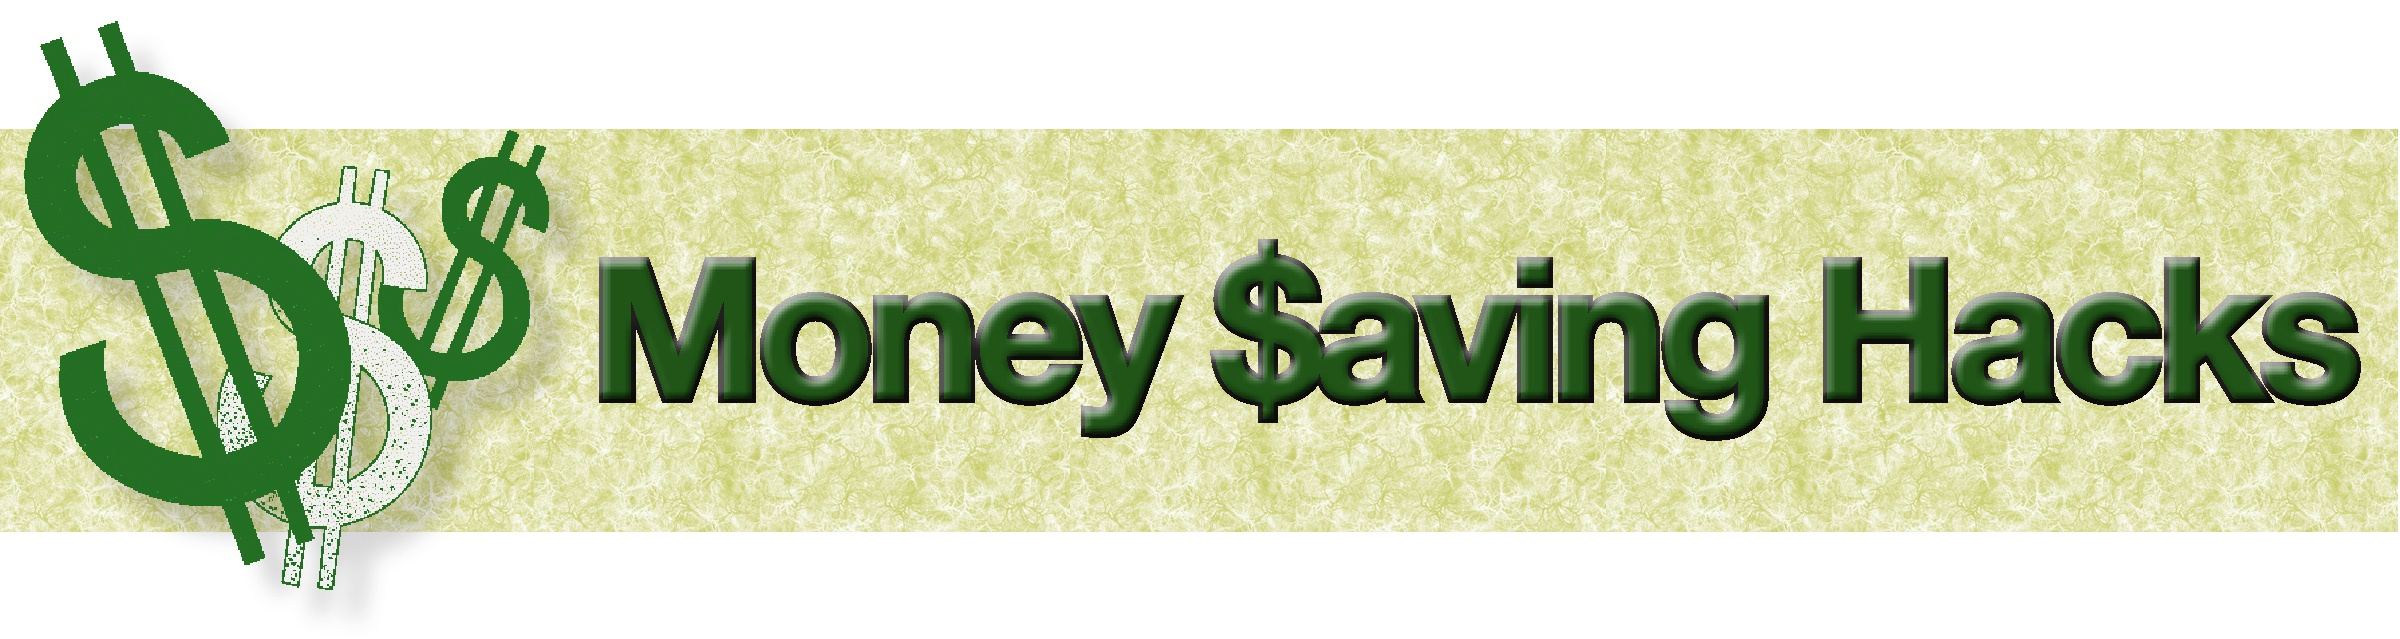 money saving hacks banner  jjc joliet junior college